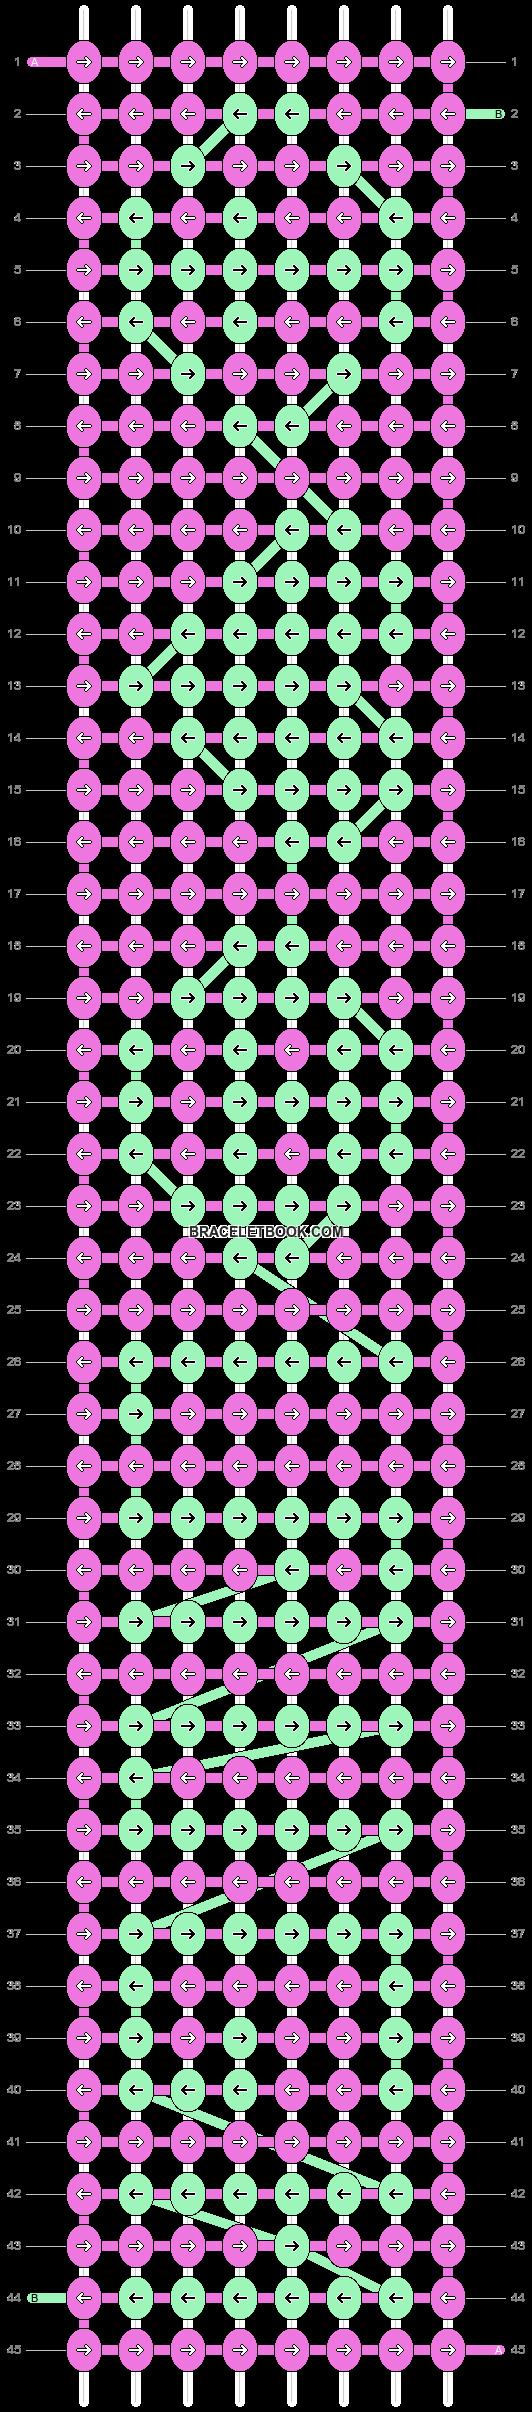 Alpha pattern #1915 pattern